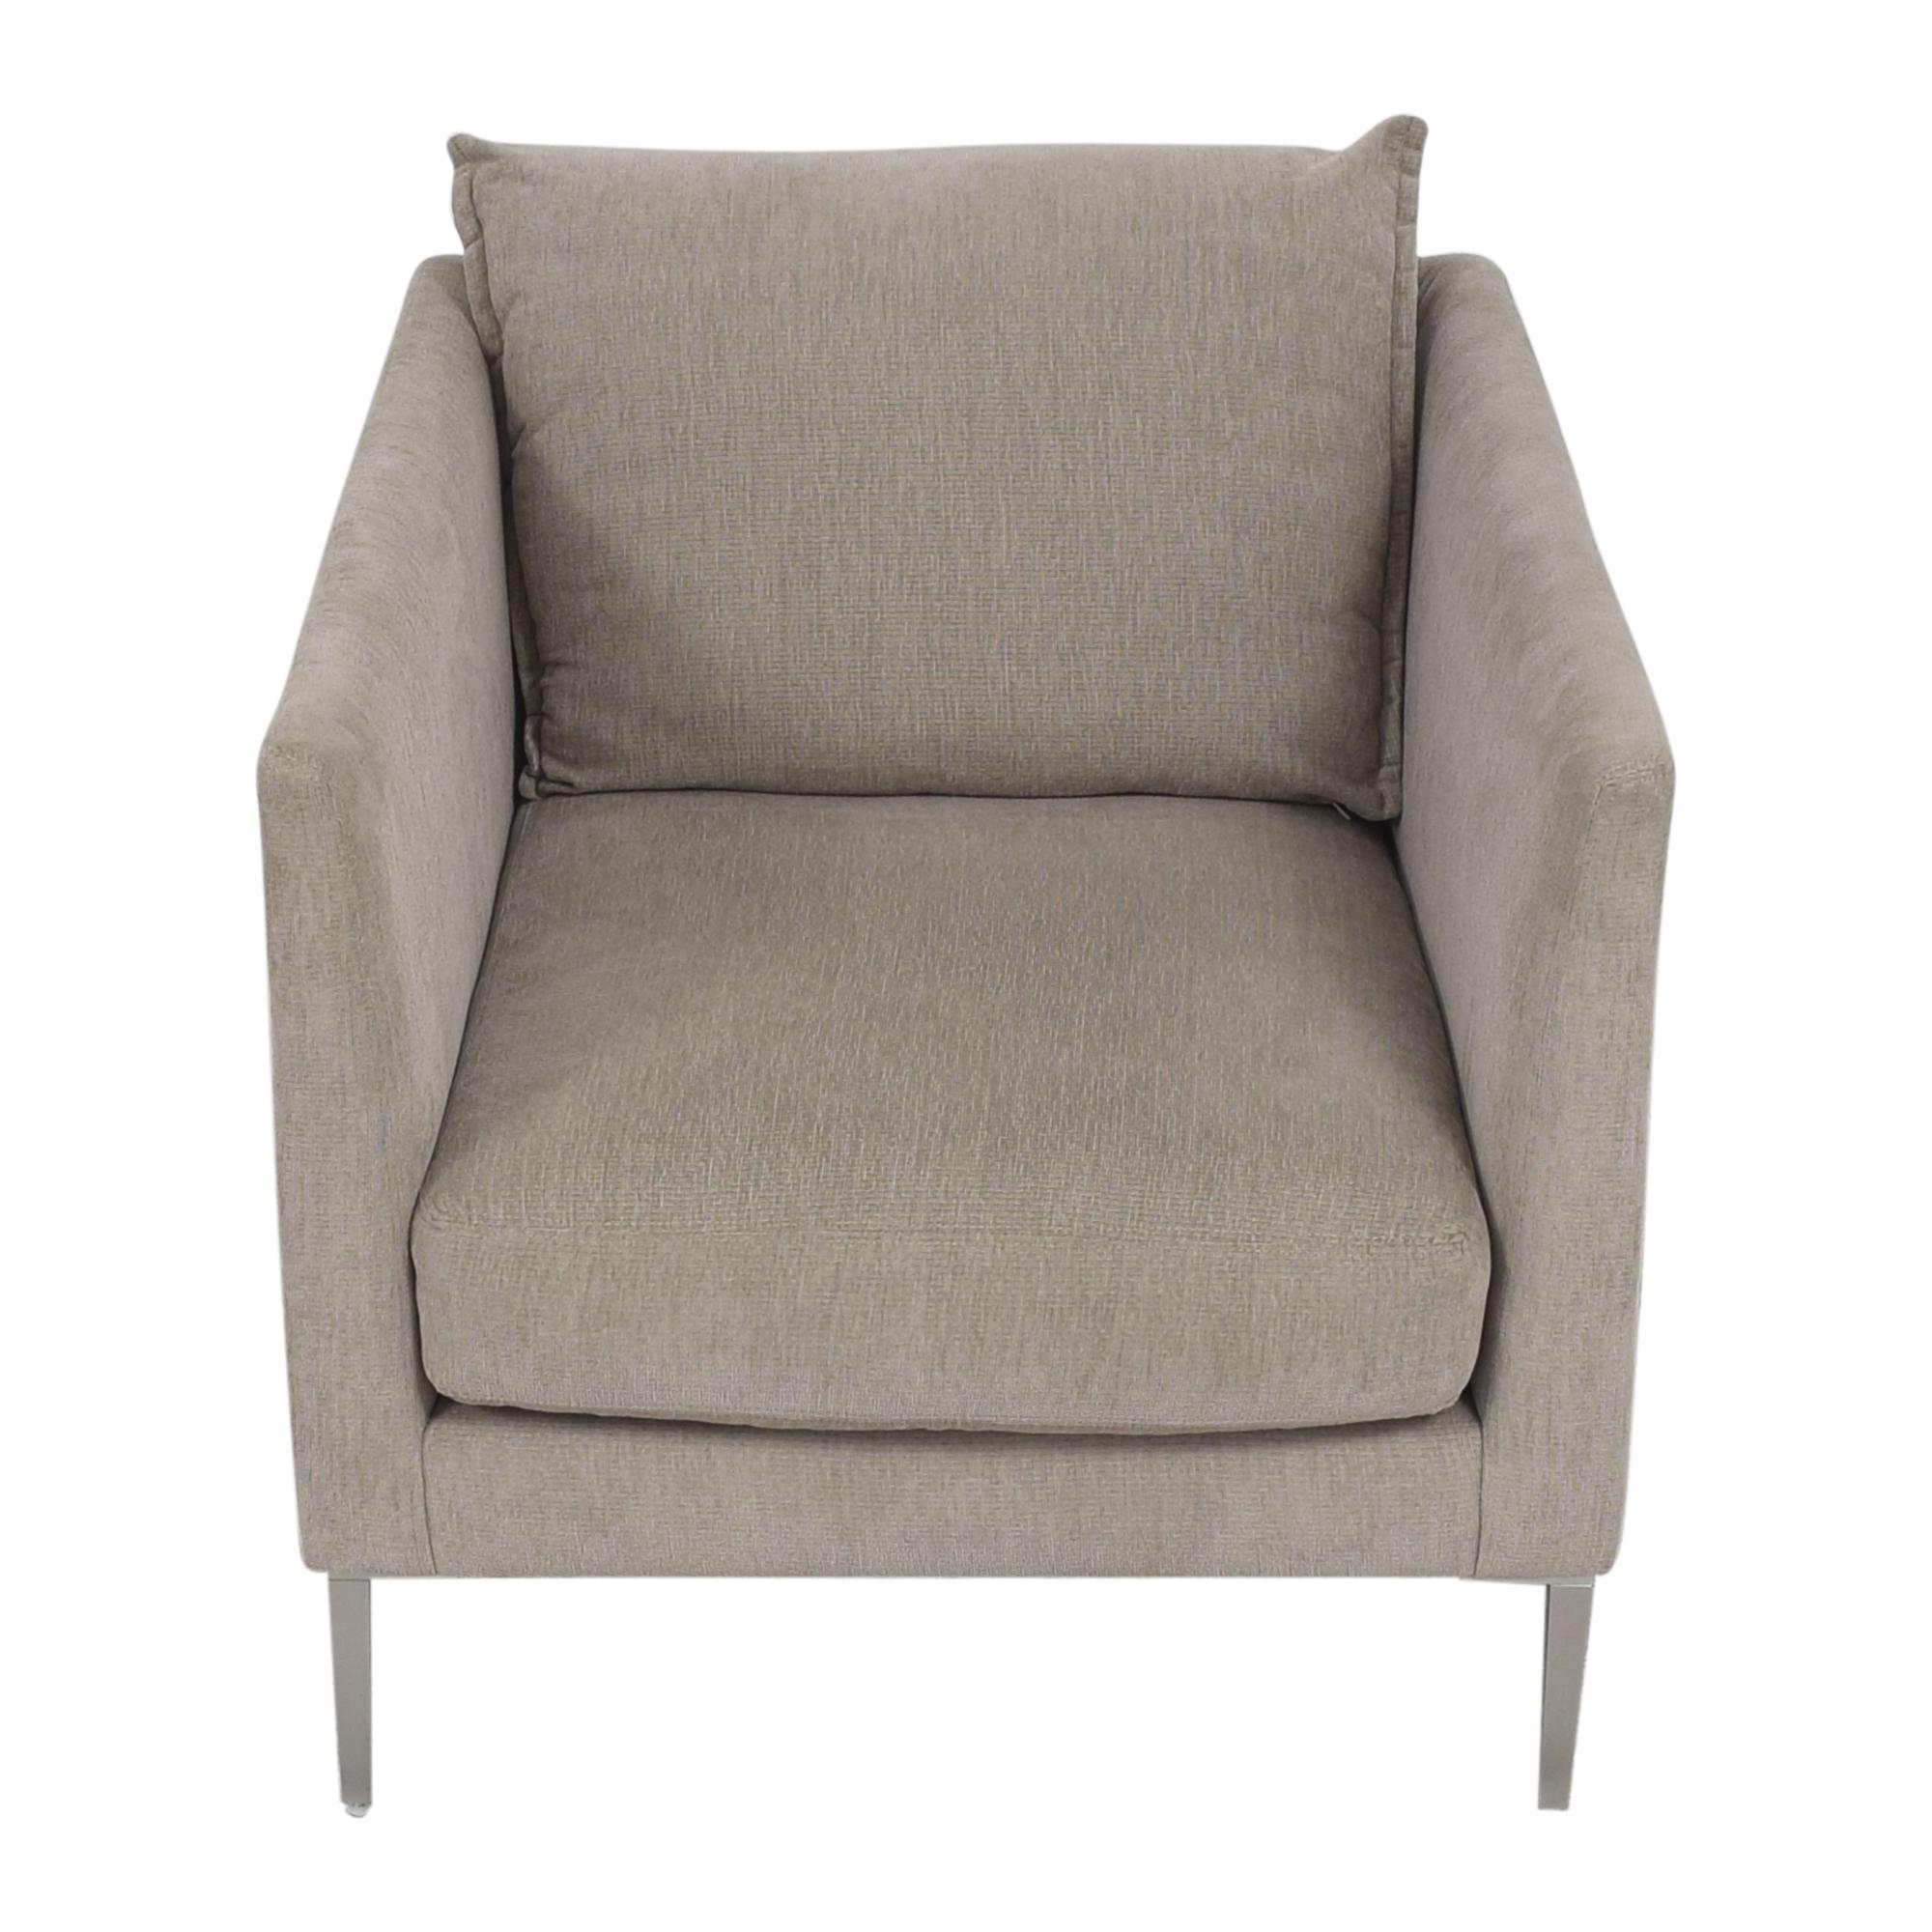 Room & Board Room & Board Vela Chair on sale